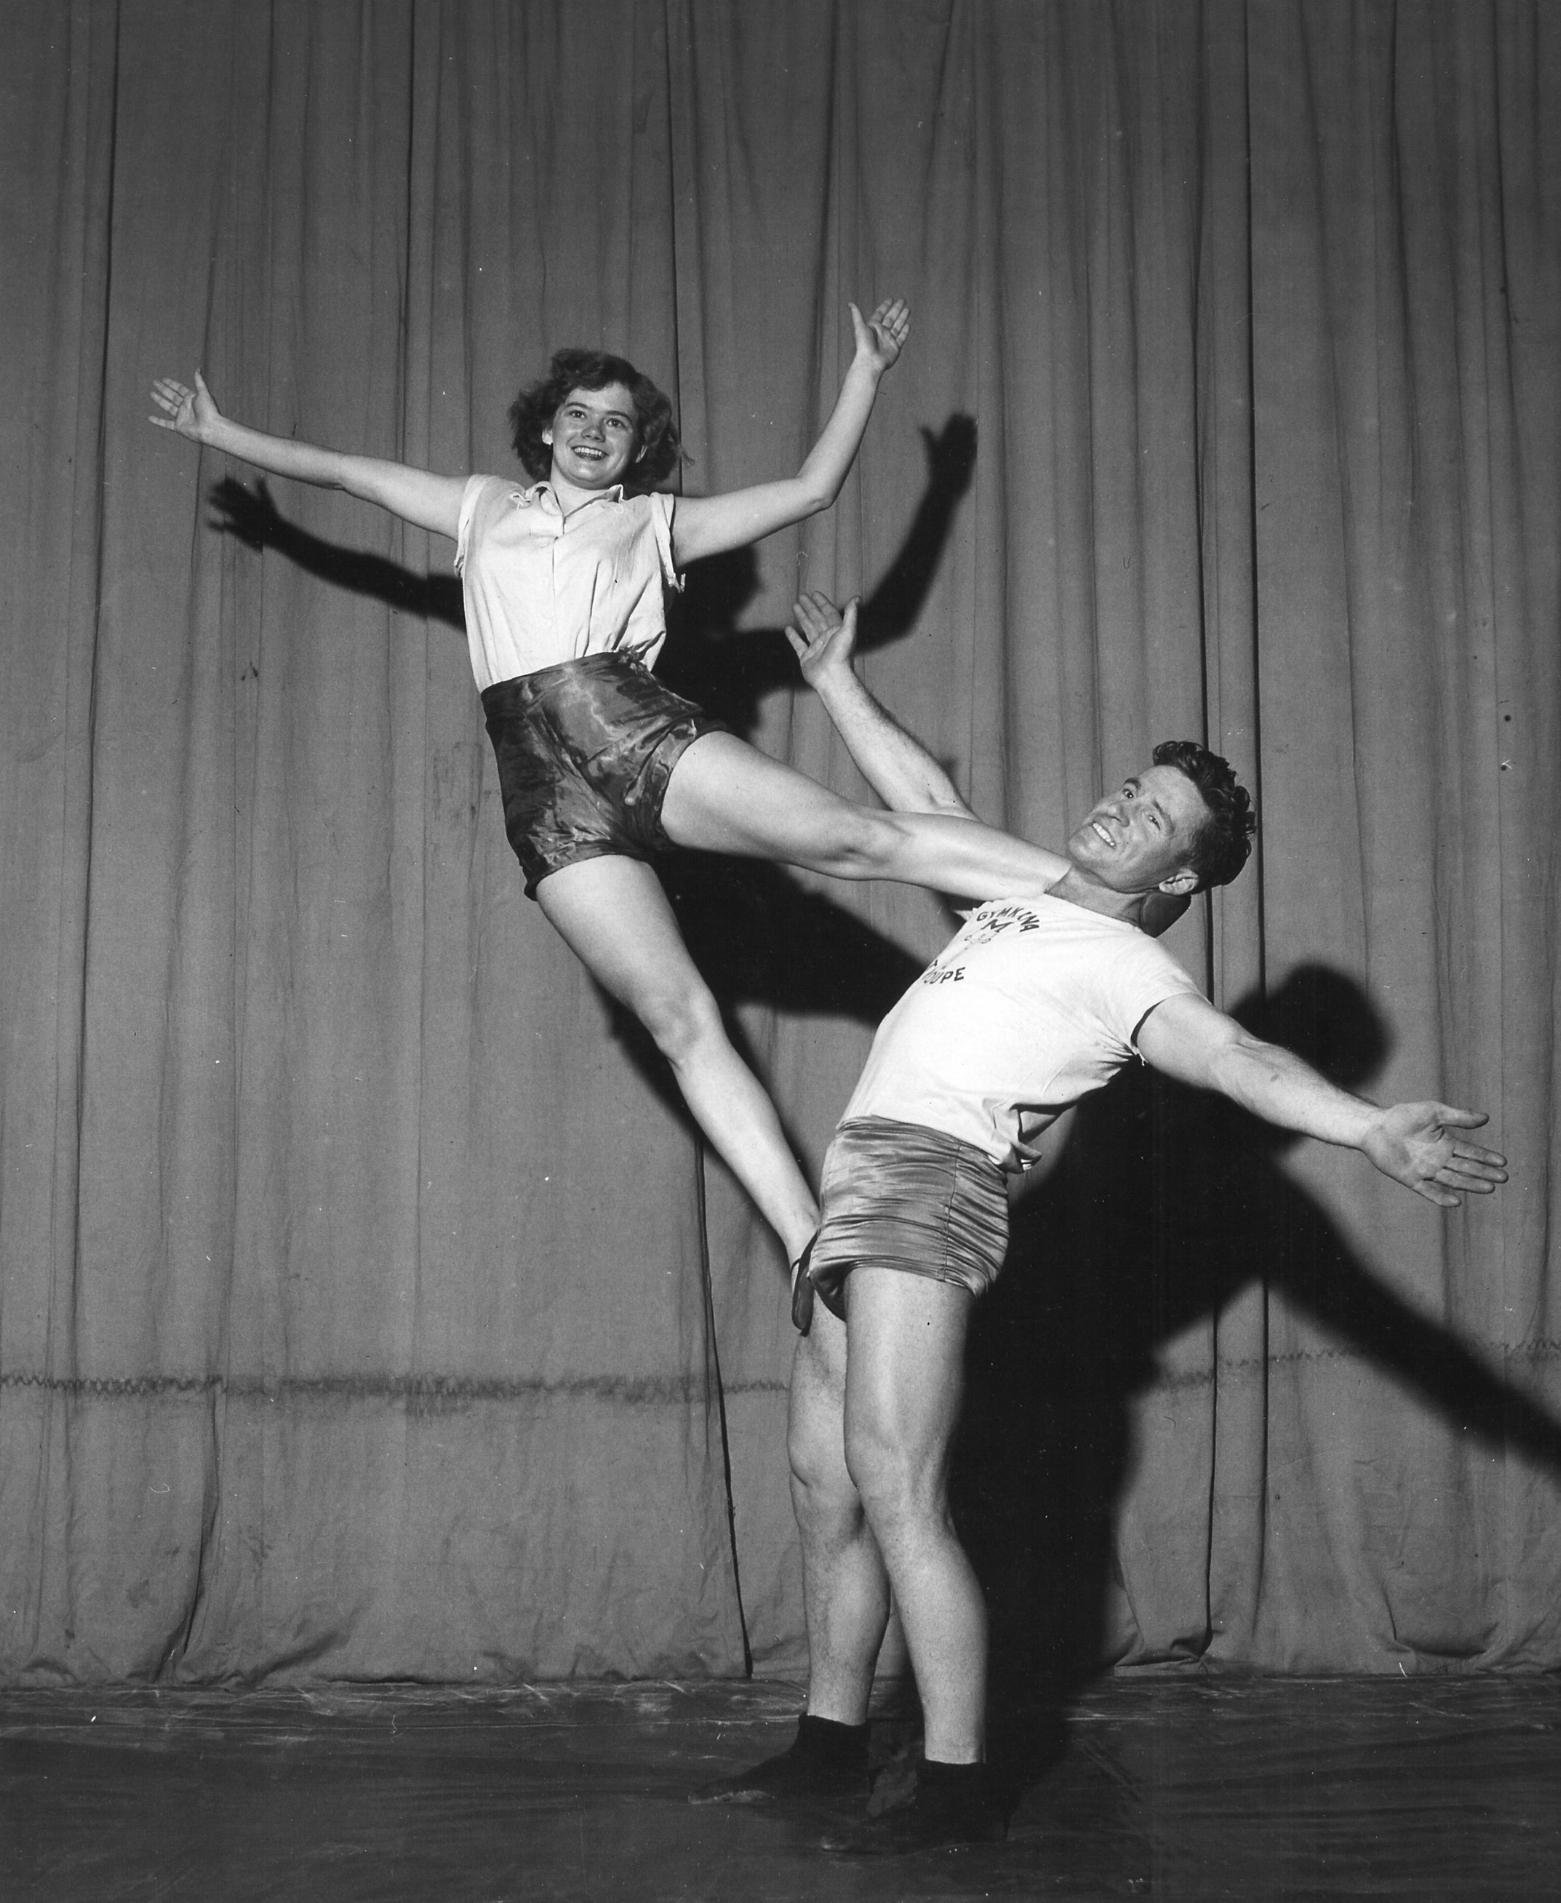 Anthony and Cleopatra (1951)